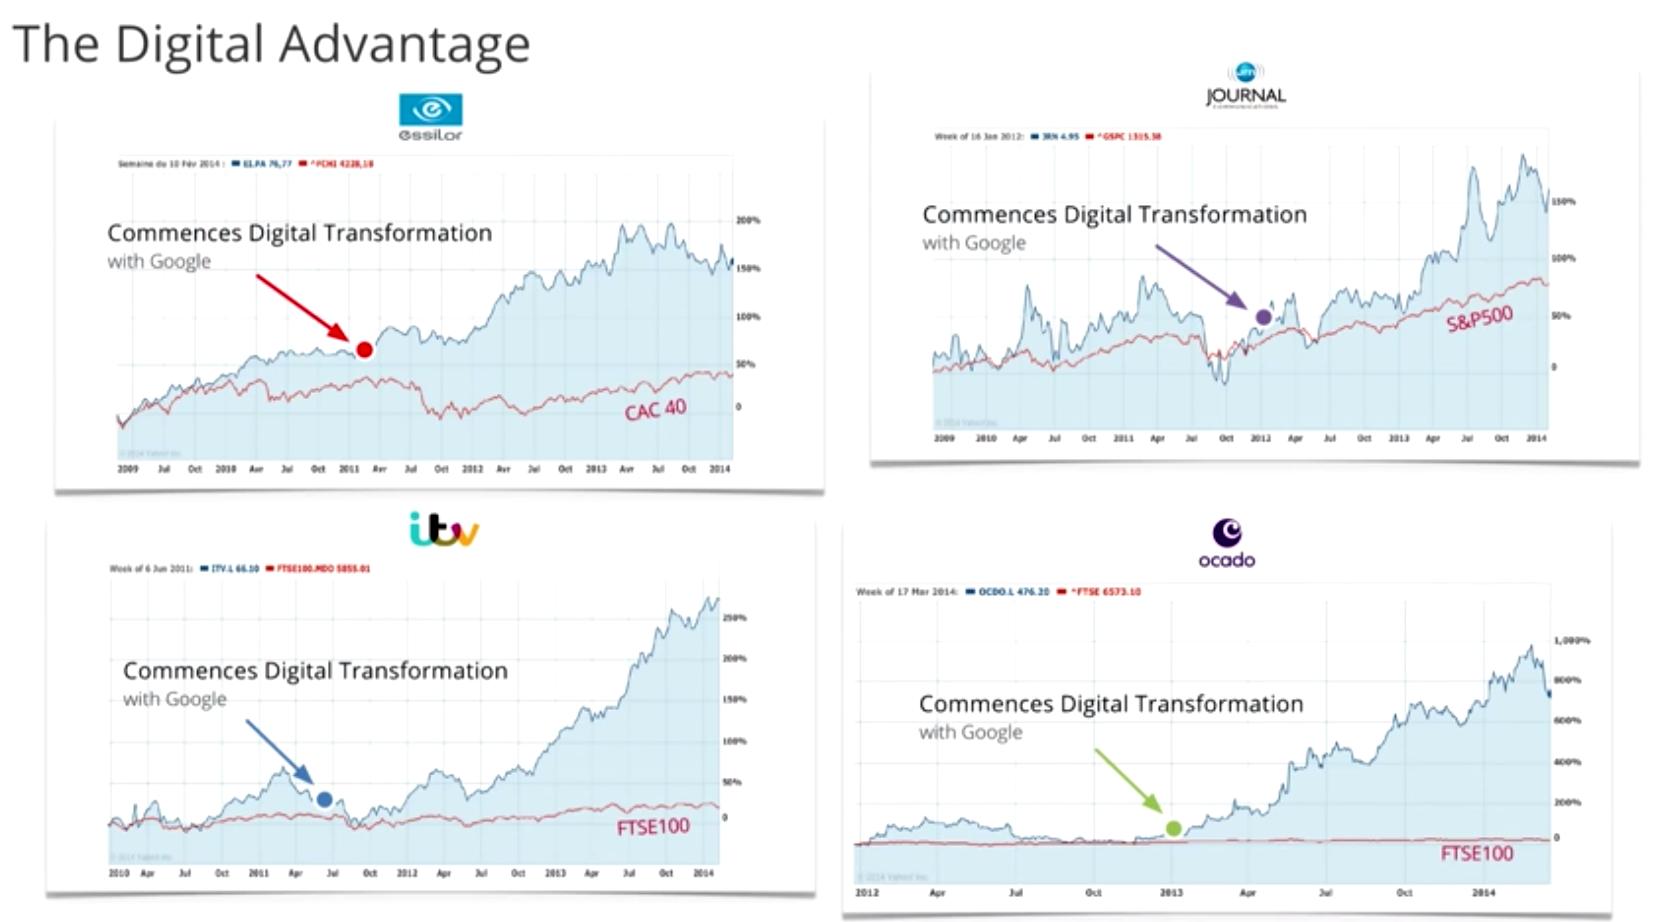 The Digital Advantage by Google